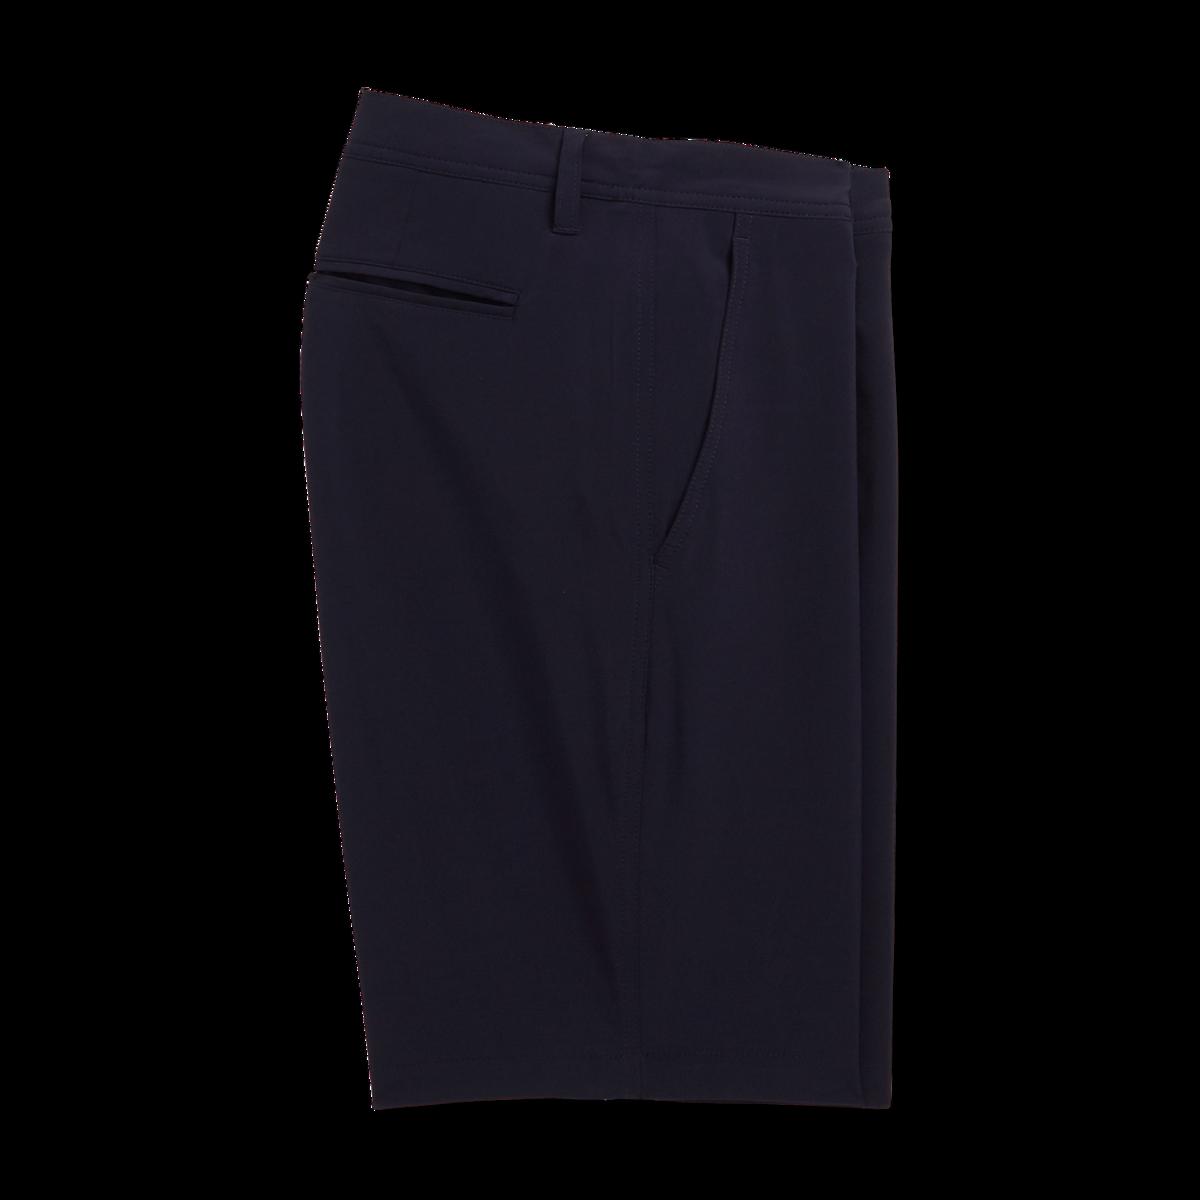 FootJoy Shorts (Navy): $78